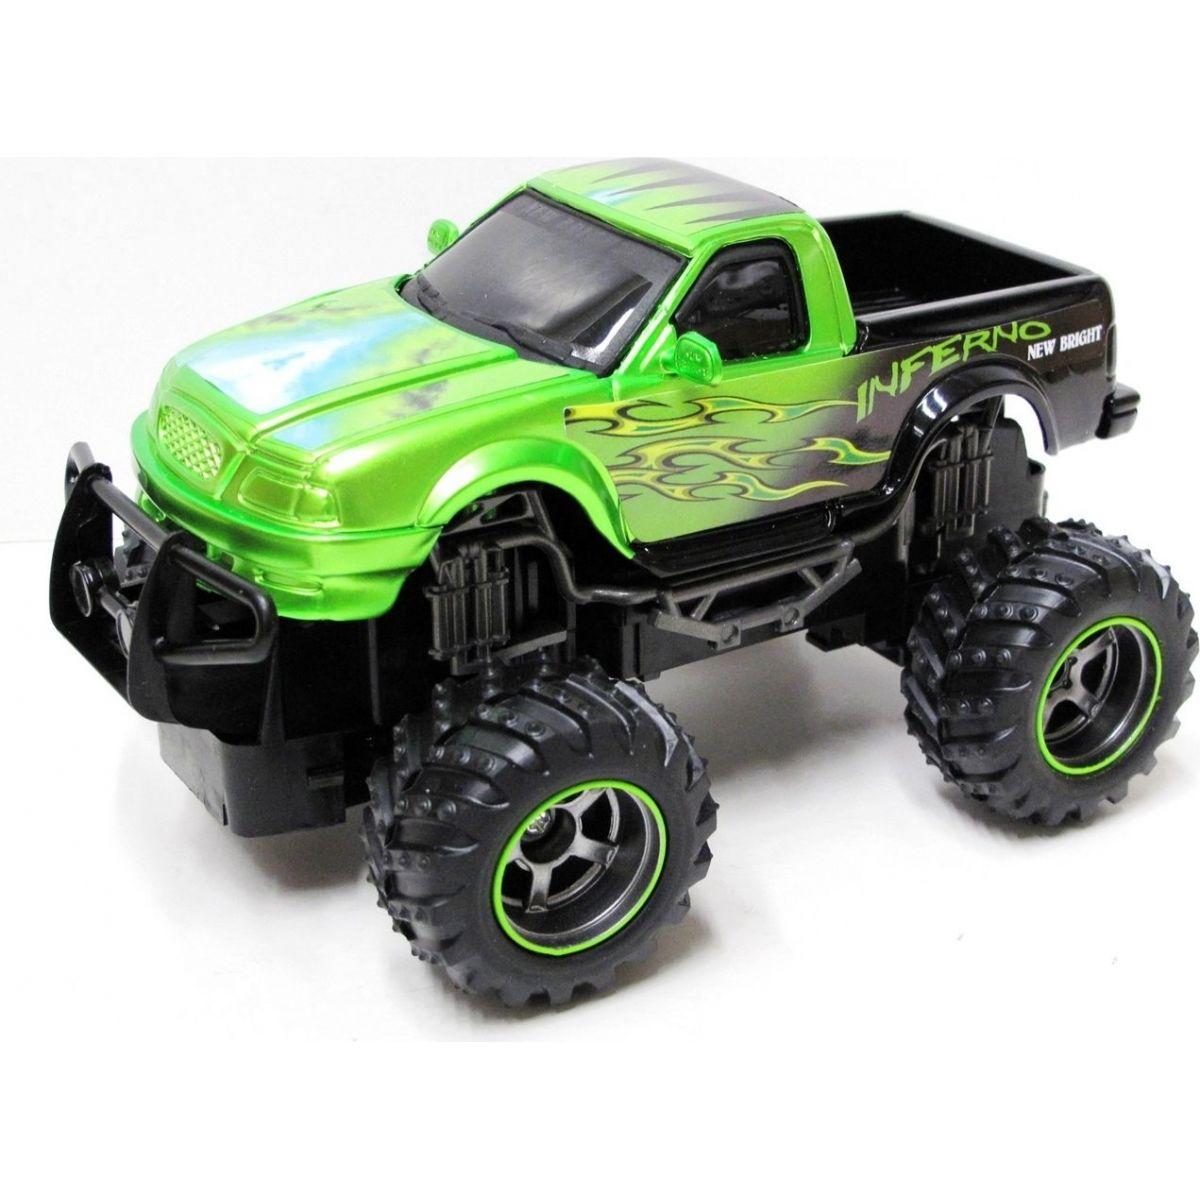 New Bright Turbo Dragons Pick Up 1:24 - Zelená